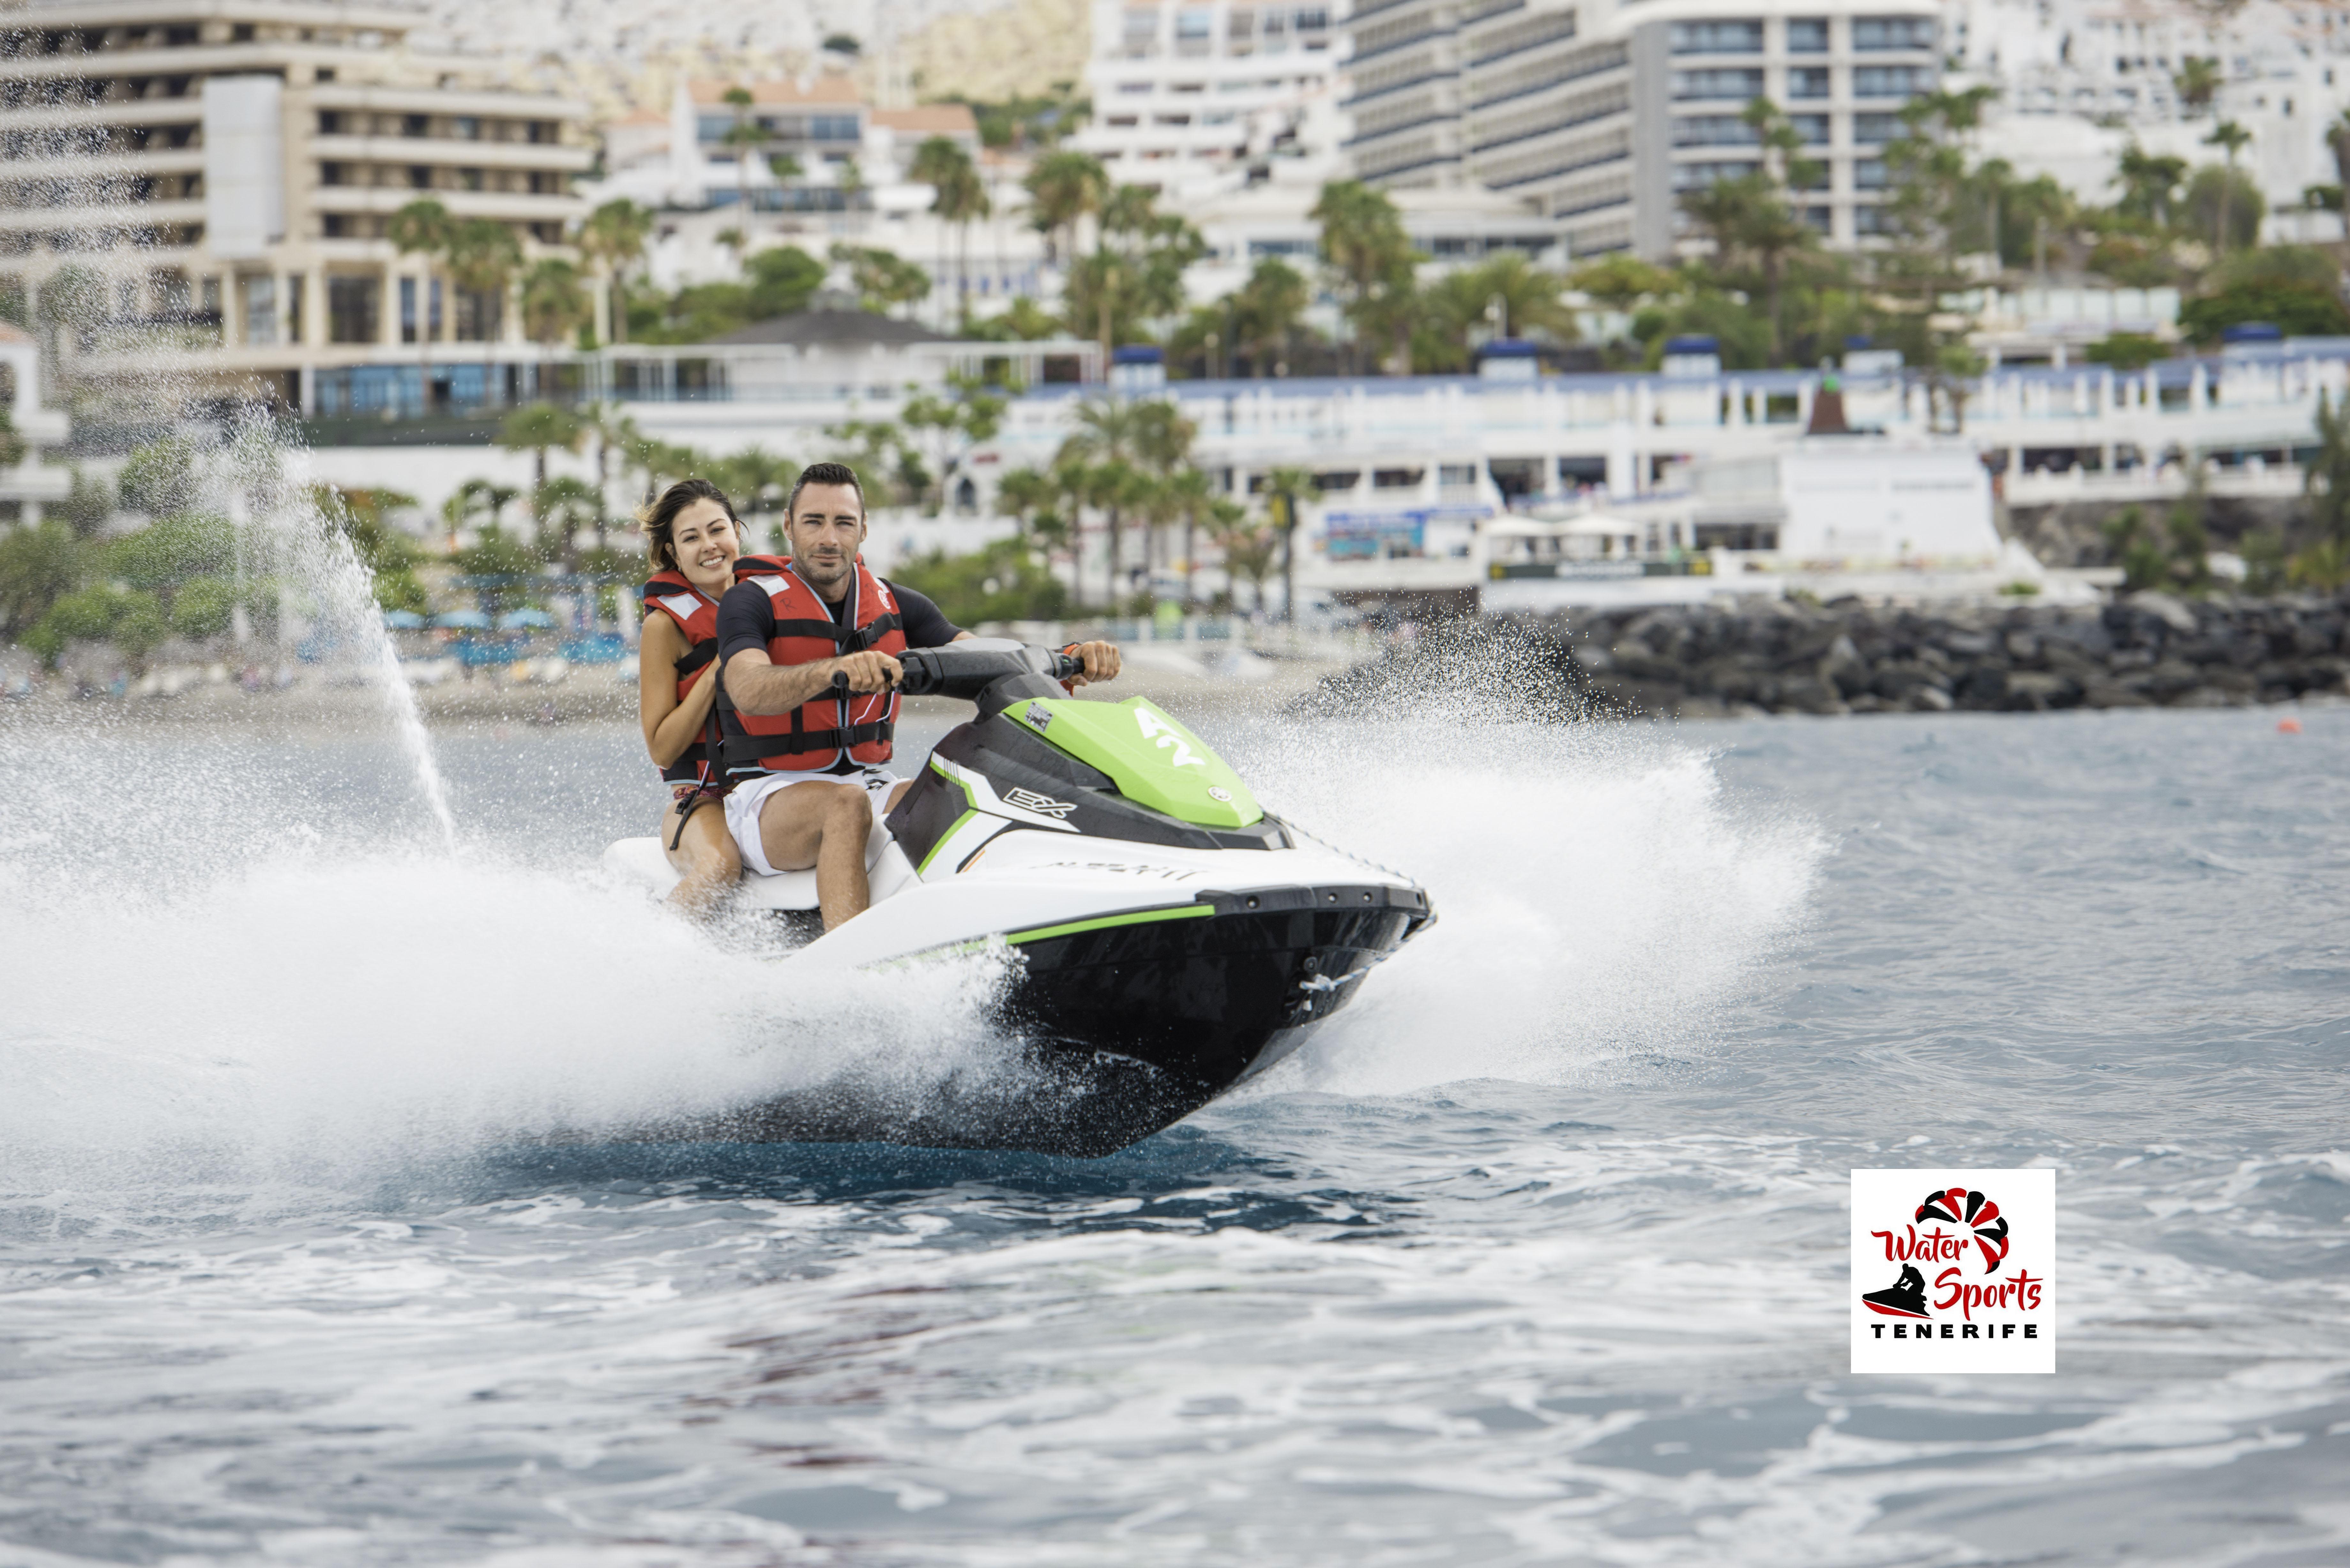 jet ski safari rent jet ski en costa adeje puerto colon